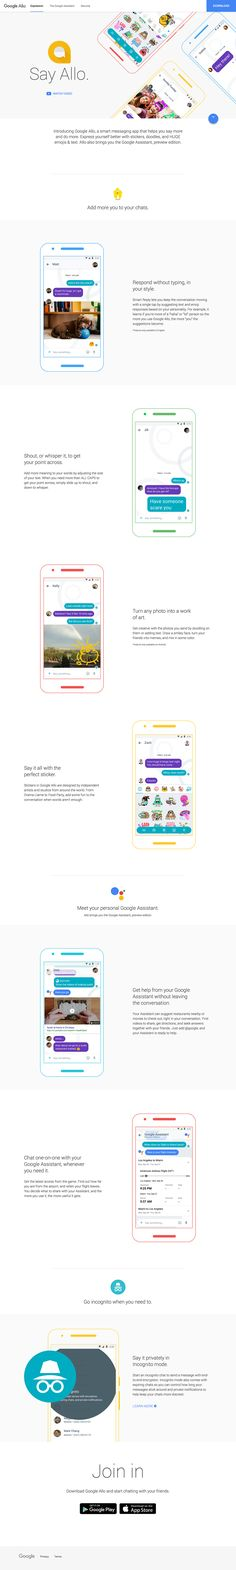 Google Allo - A smart messaging app